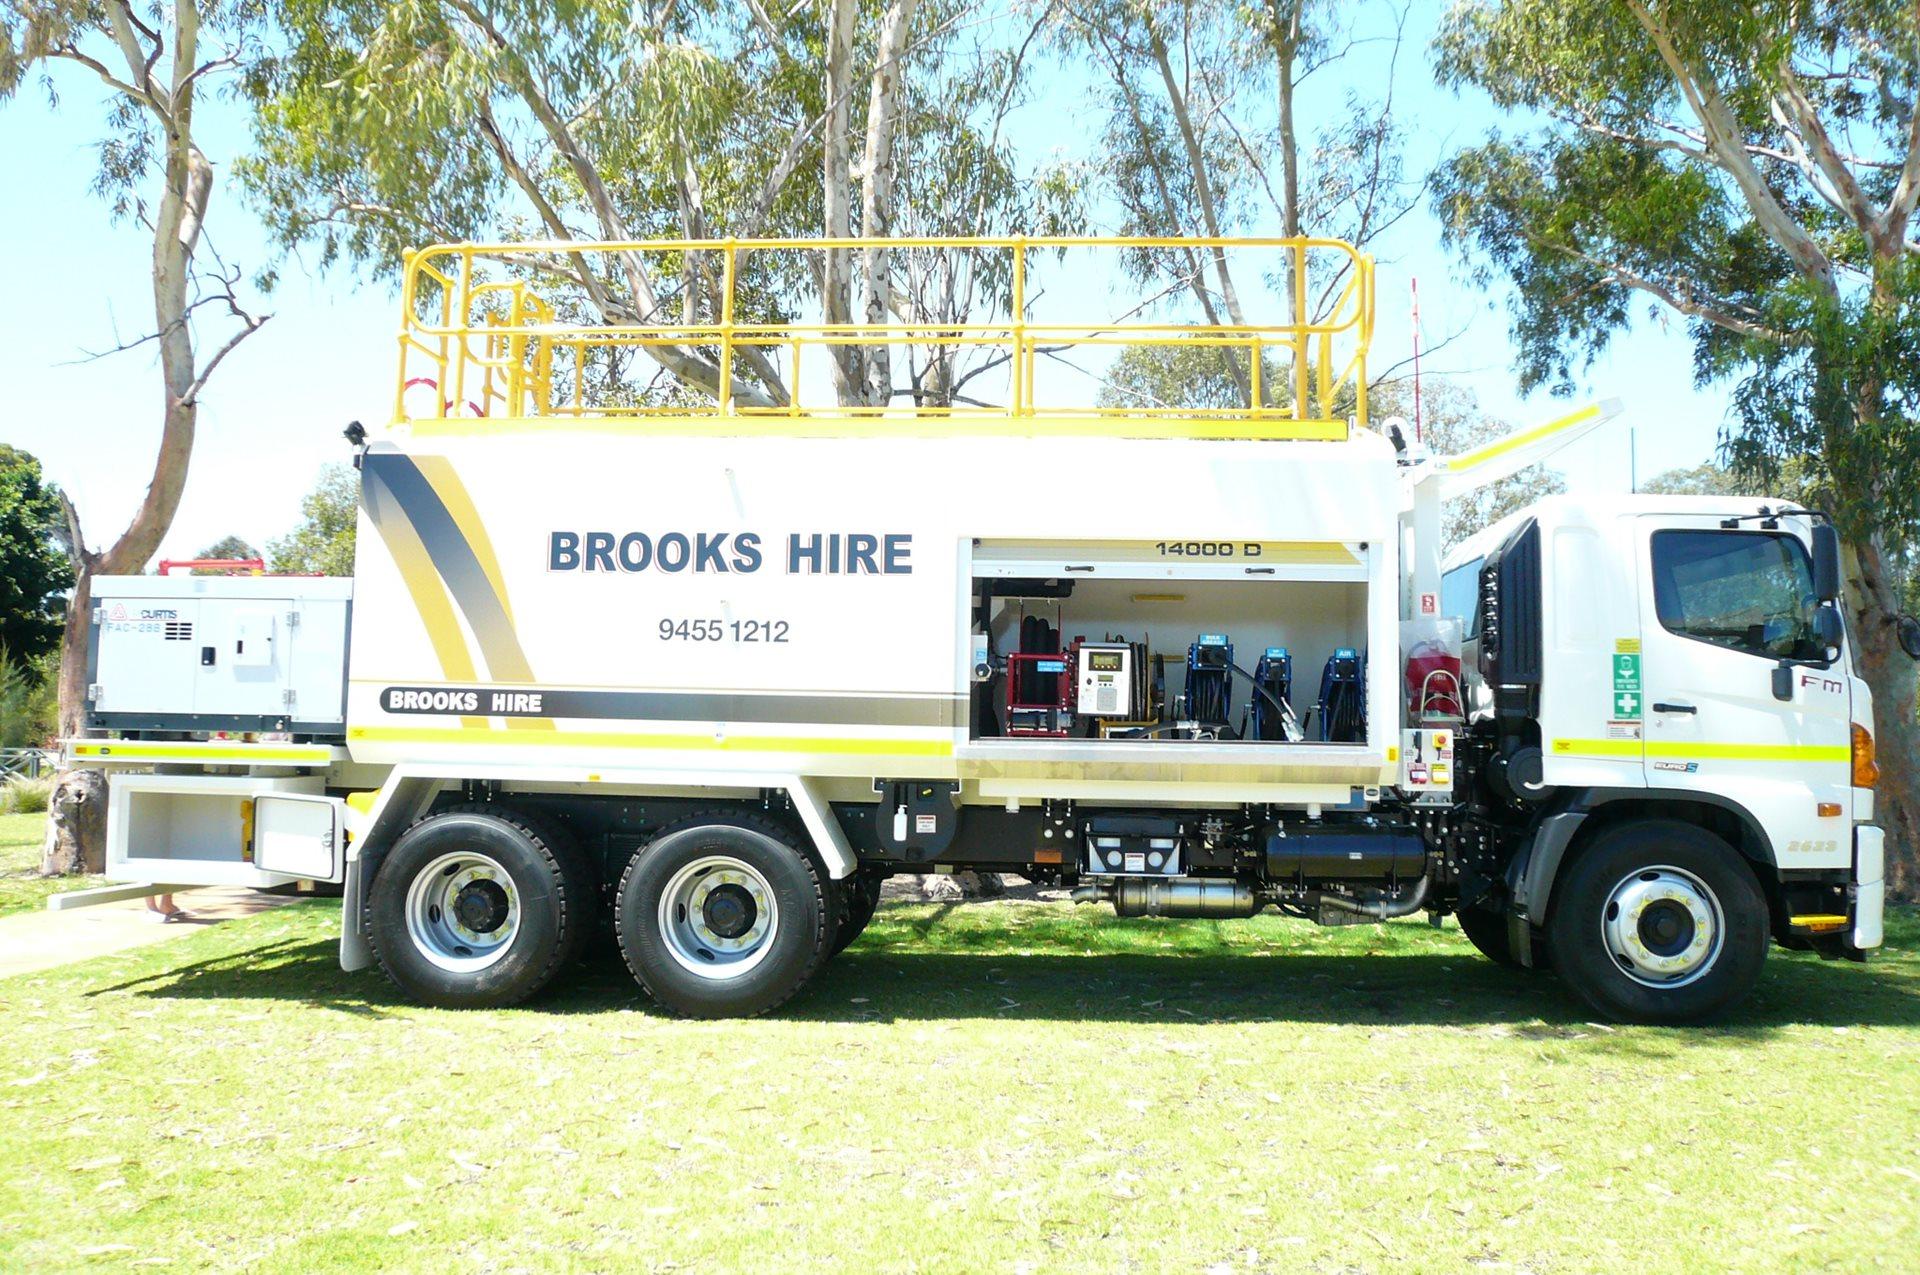 Brooks Hire Fuel Truck Trailer Hire